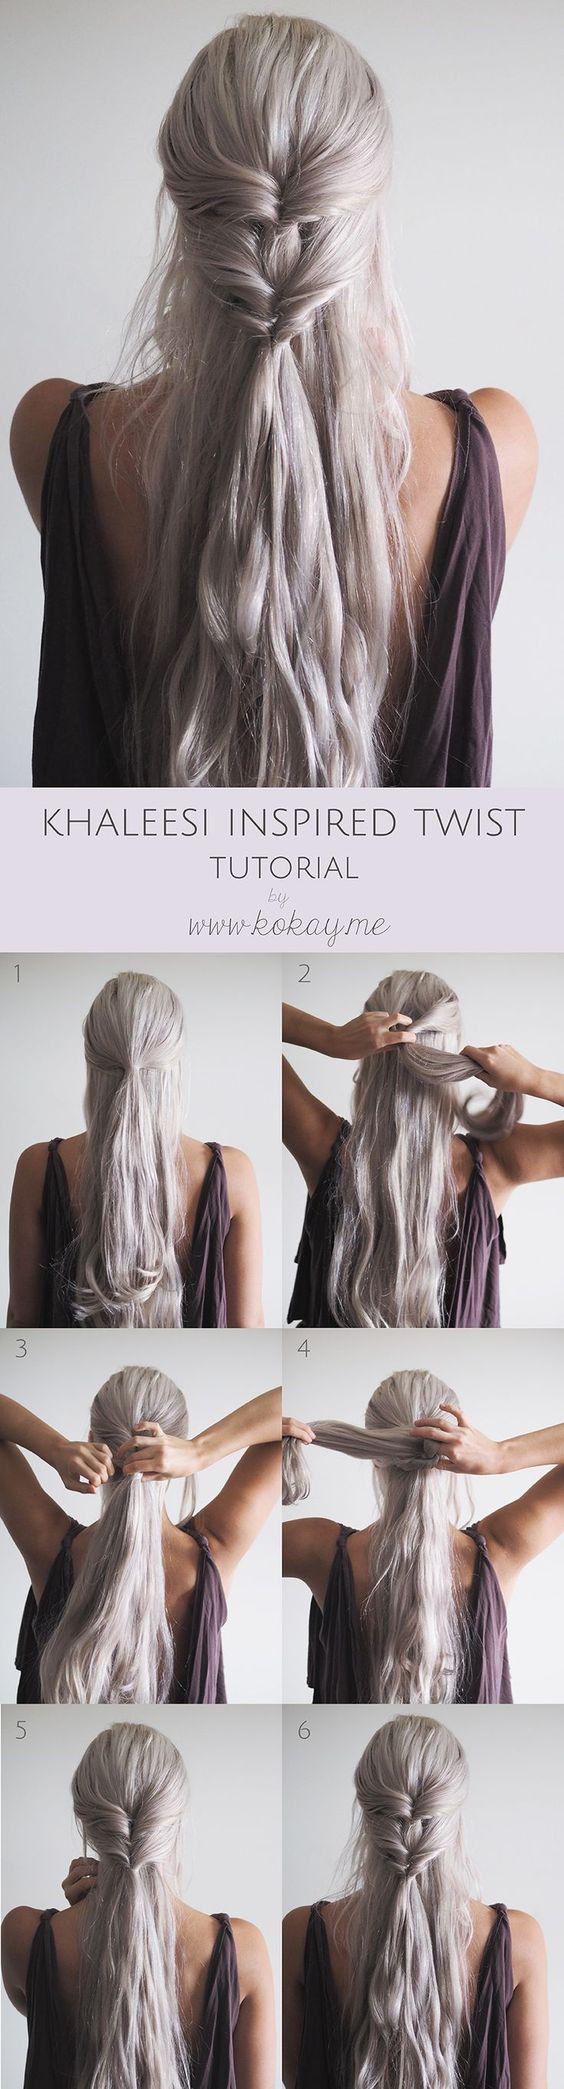 Beautiful Half Up Khaleesi inspired twist tutorial - full instructions included #bohobabe...x